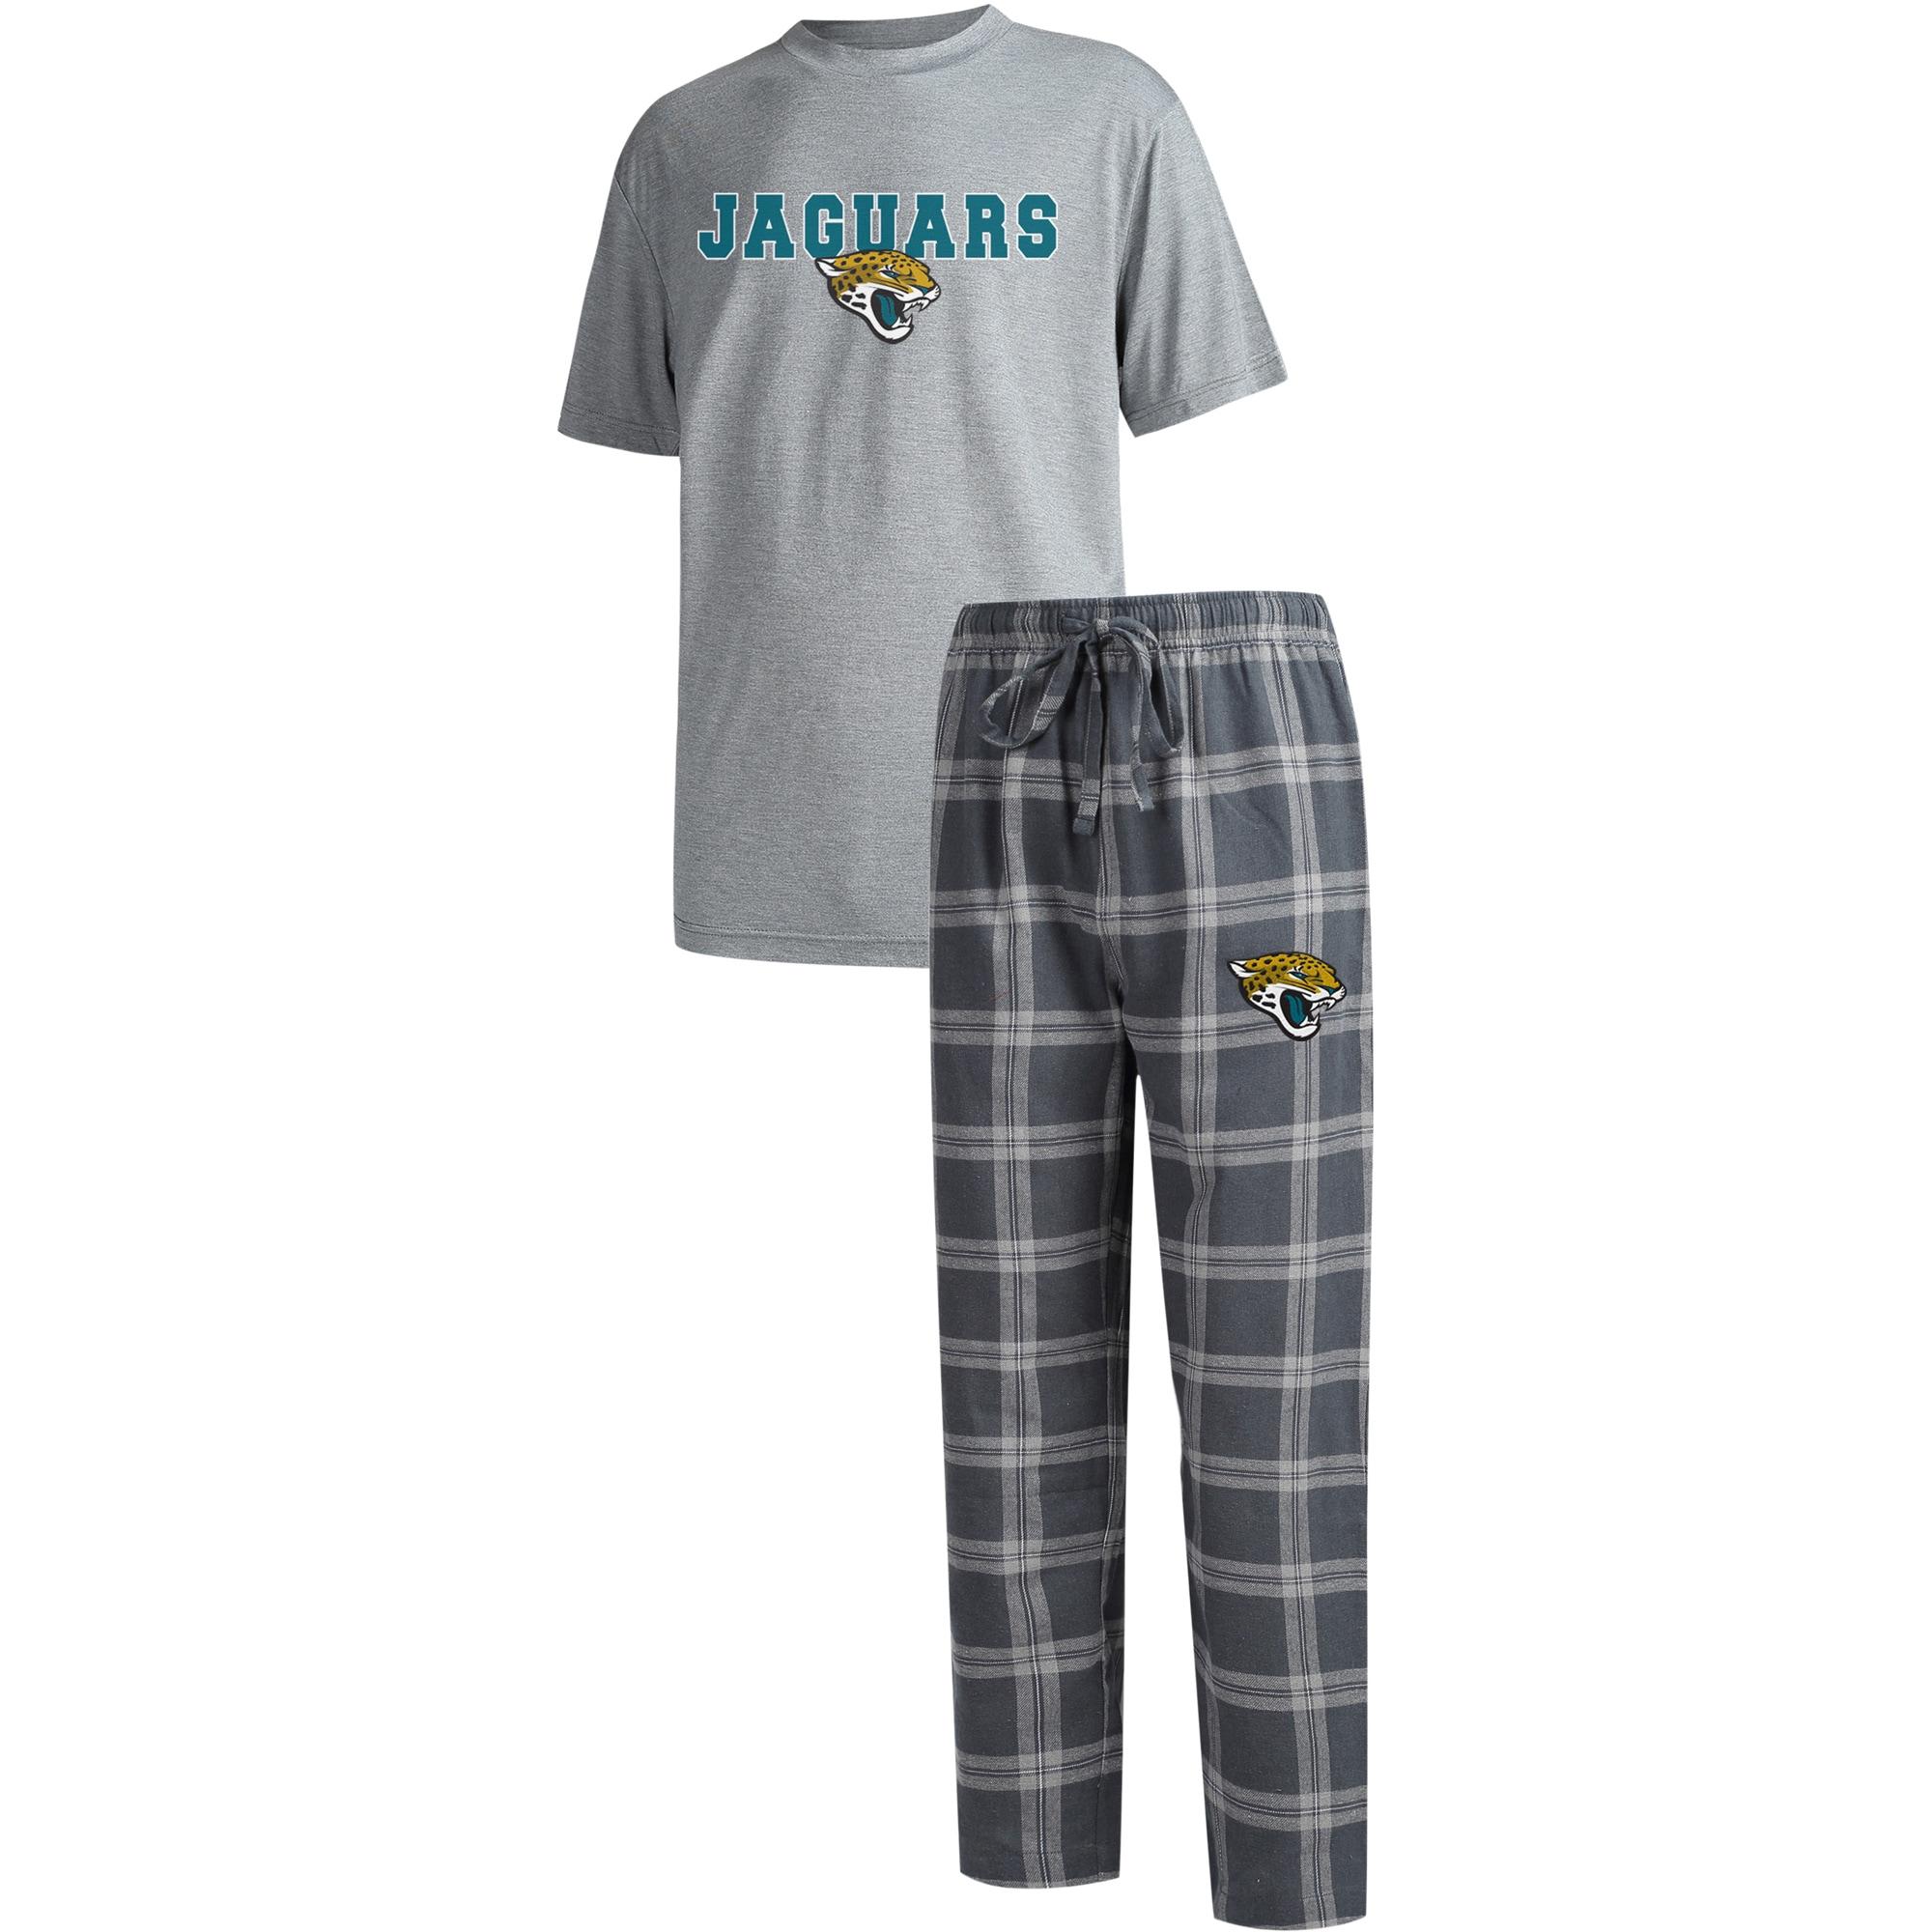 Jacksonville Jaguars Concepts Sport Big & Tall Troupe T-Shirt & Pants Sleep Set - Charcoal/Heathered Gray